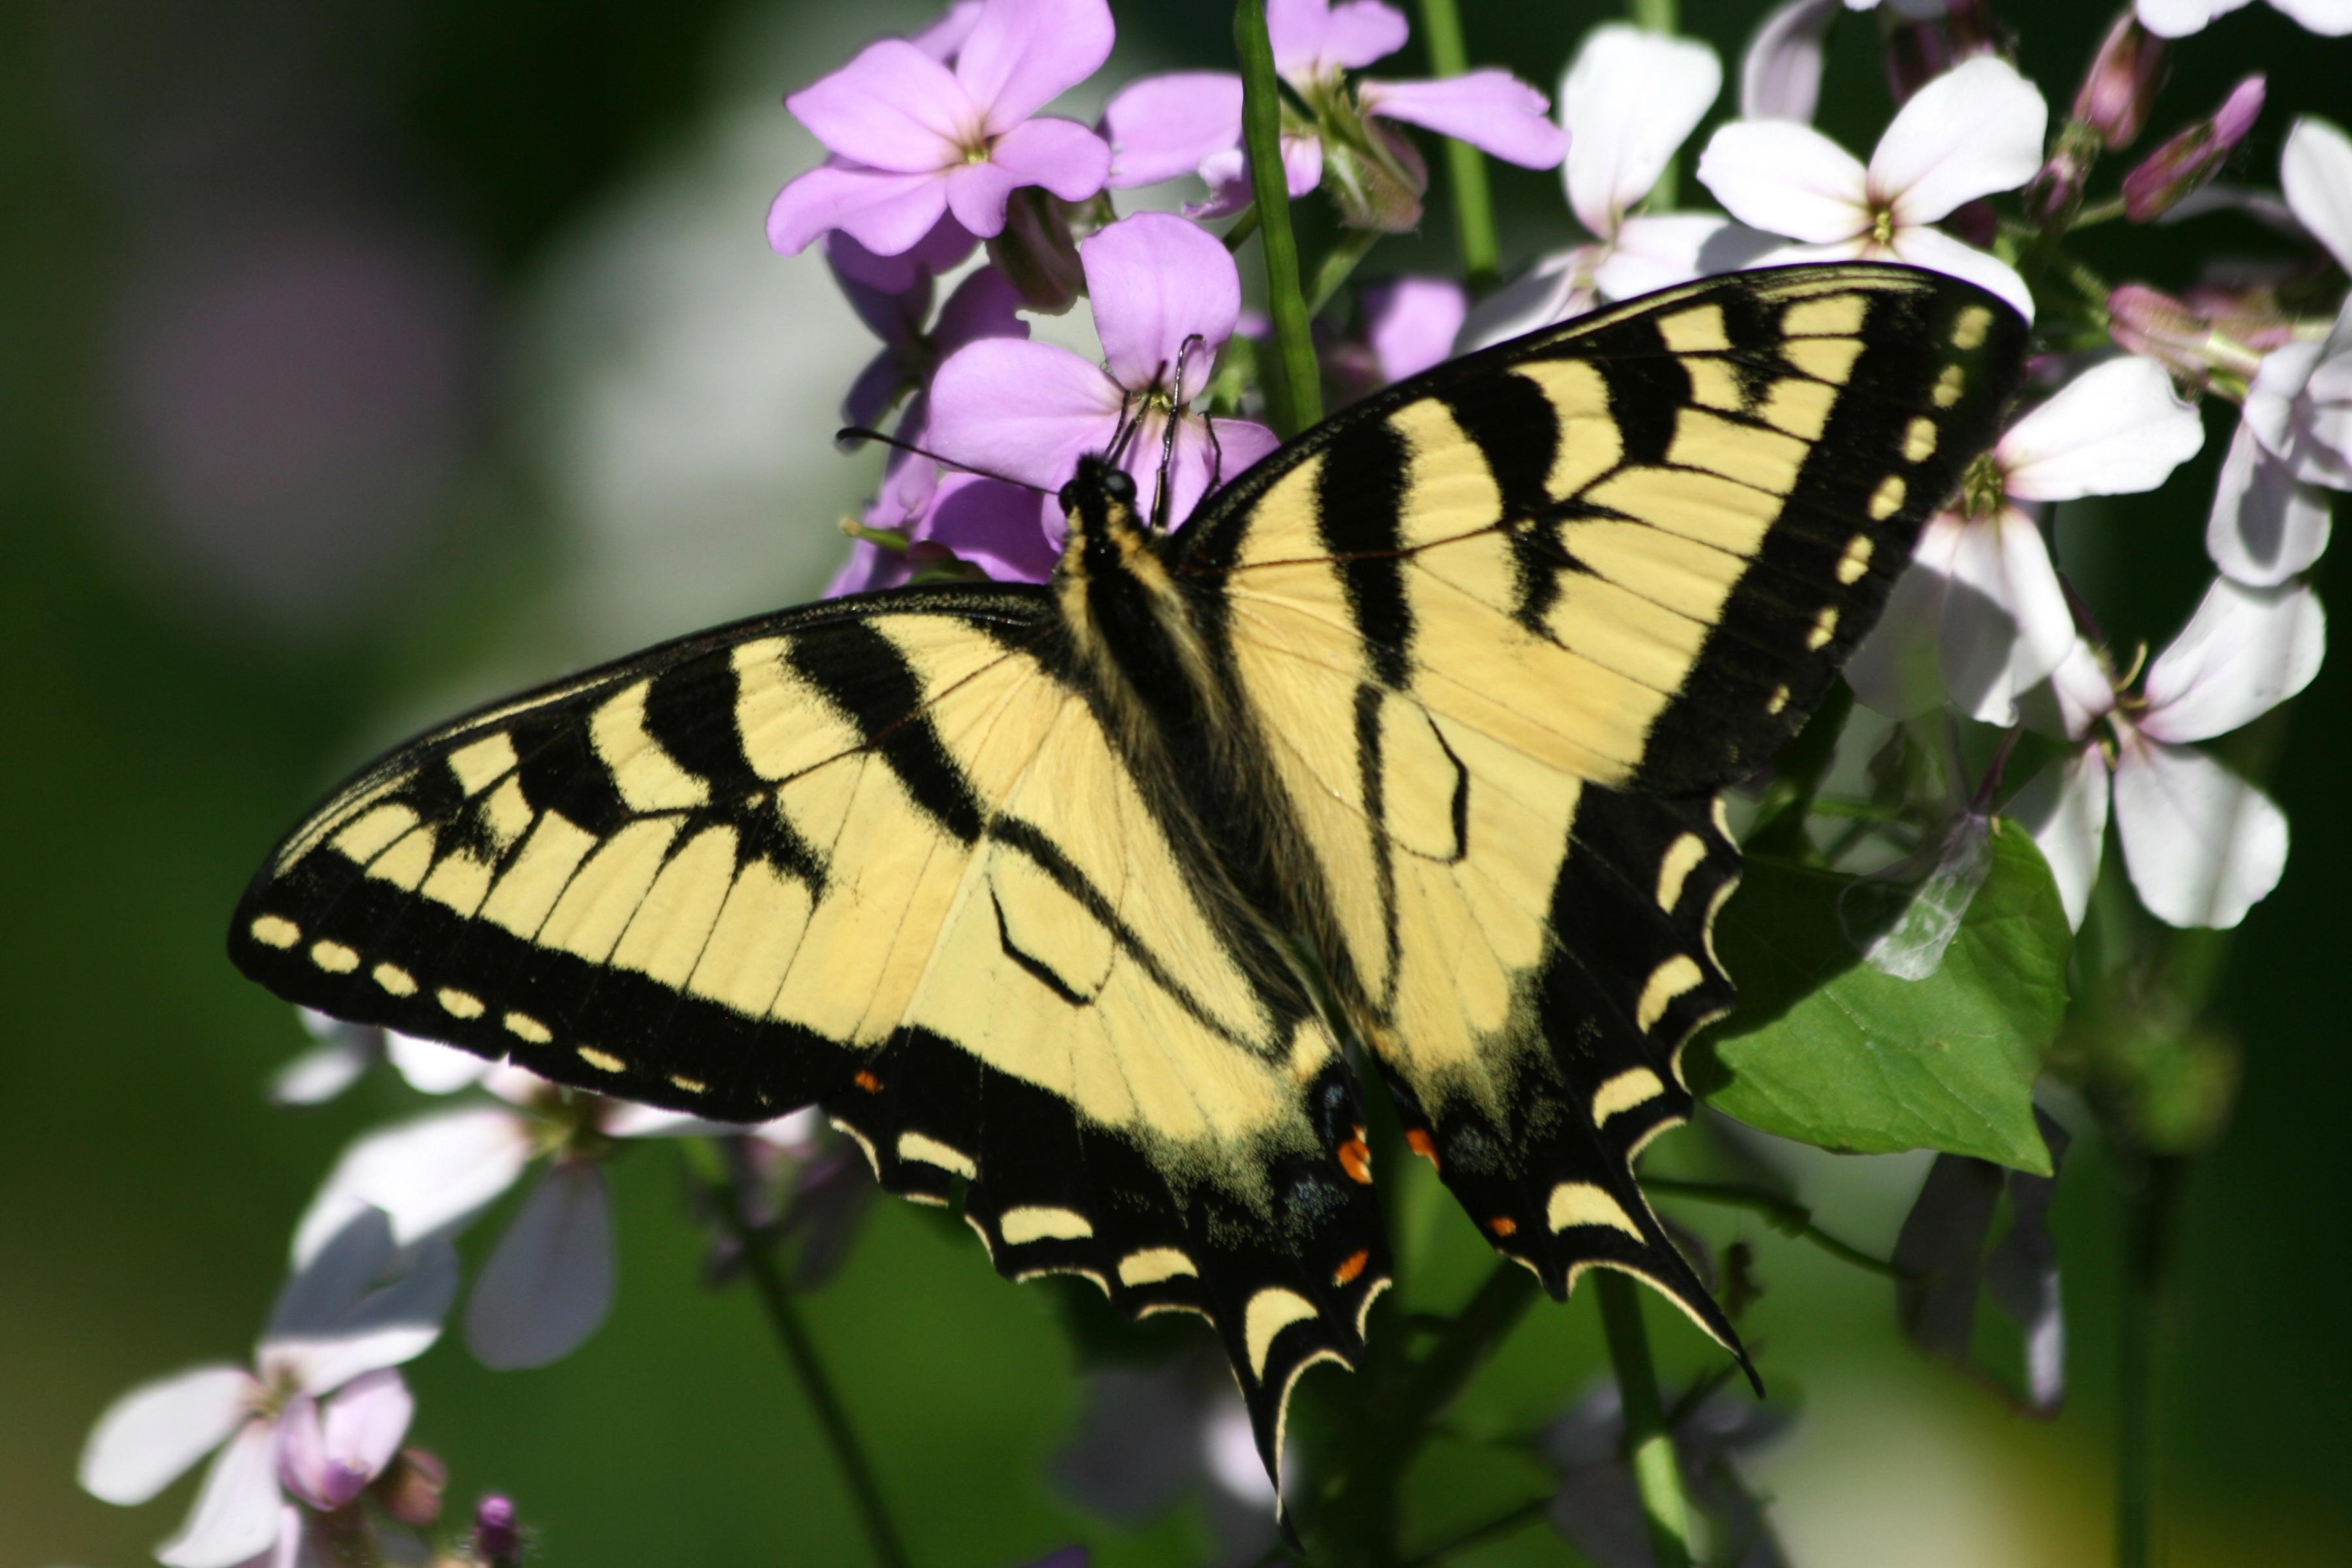 Eastern Tiger Swallowtail Butterflies | Naturally Curious ...